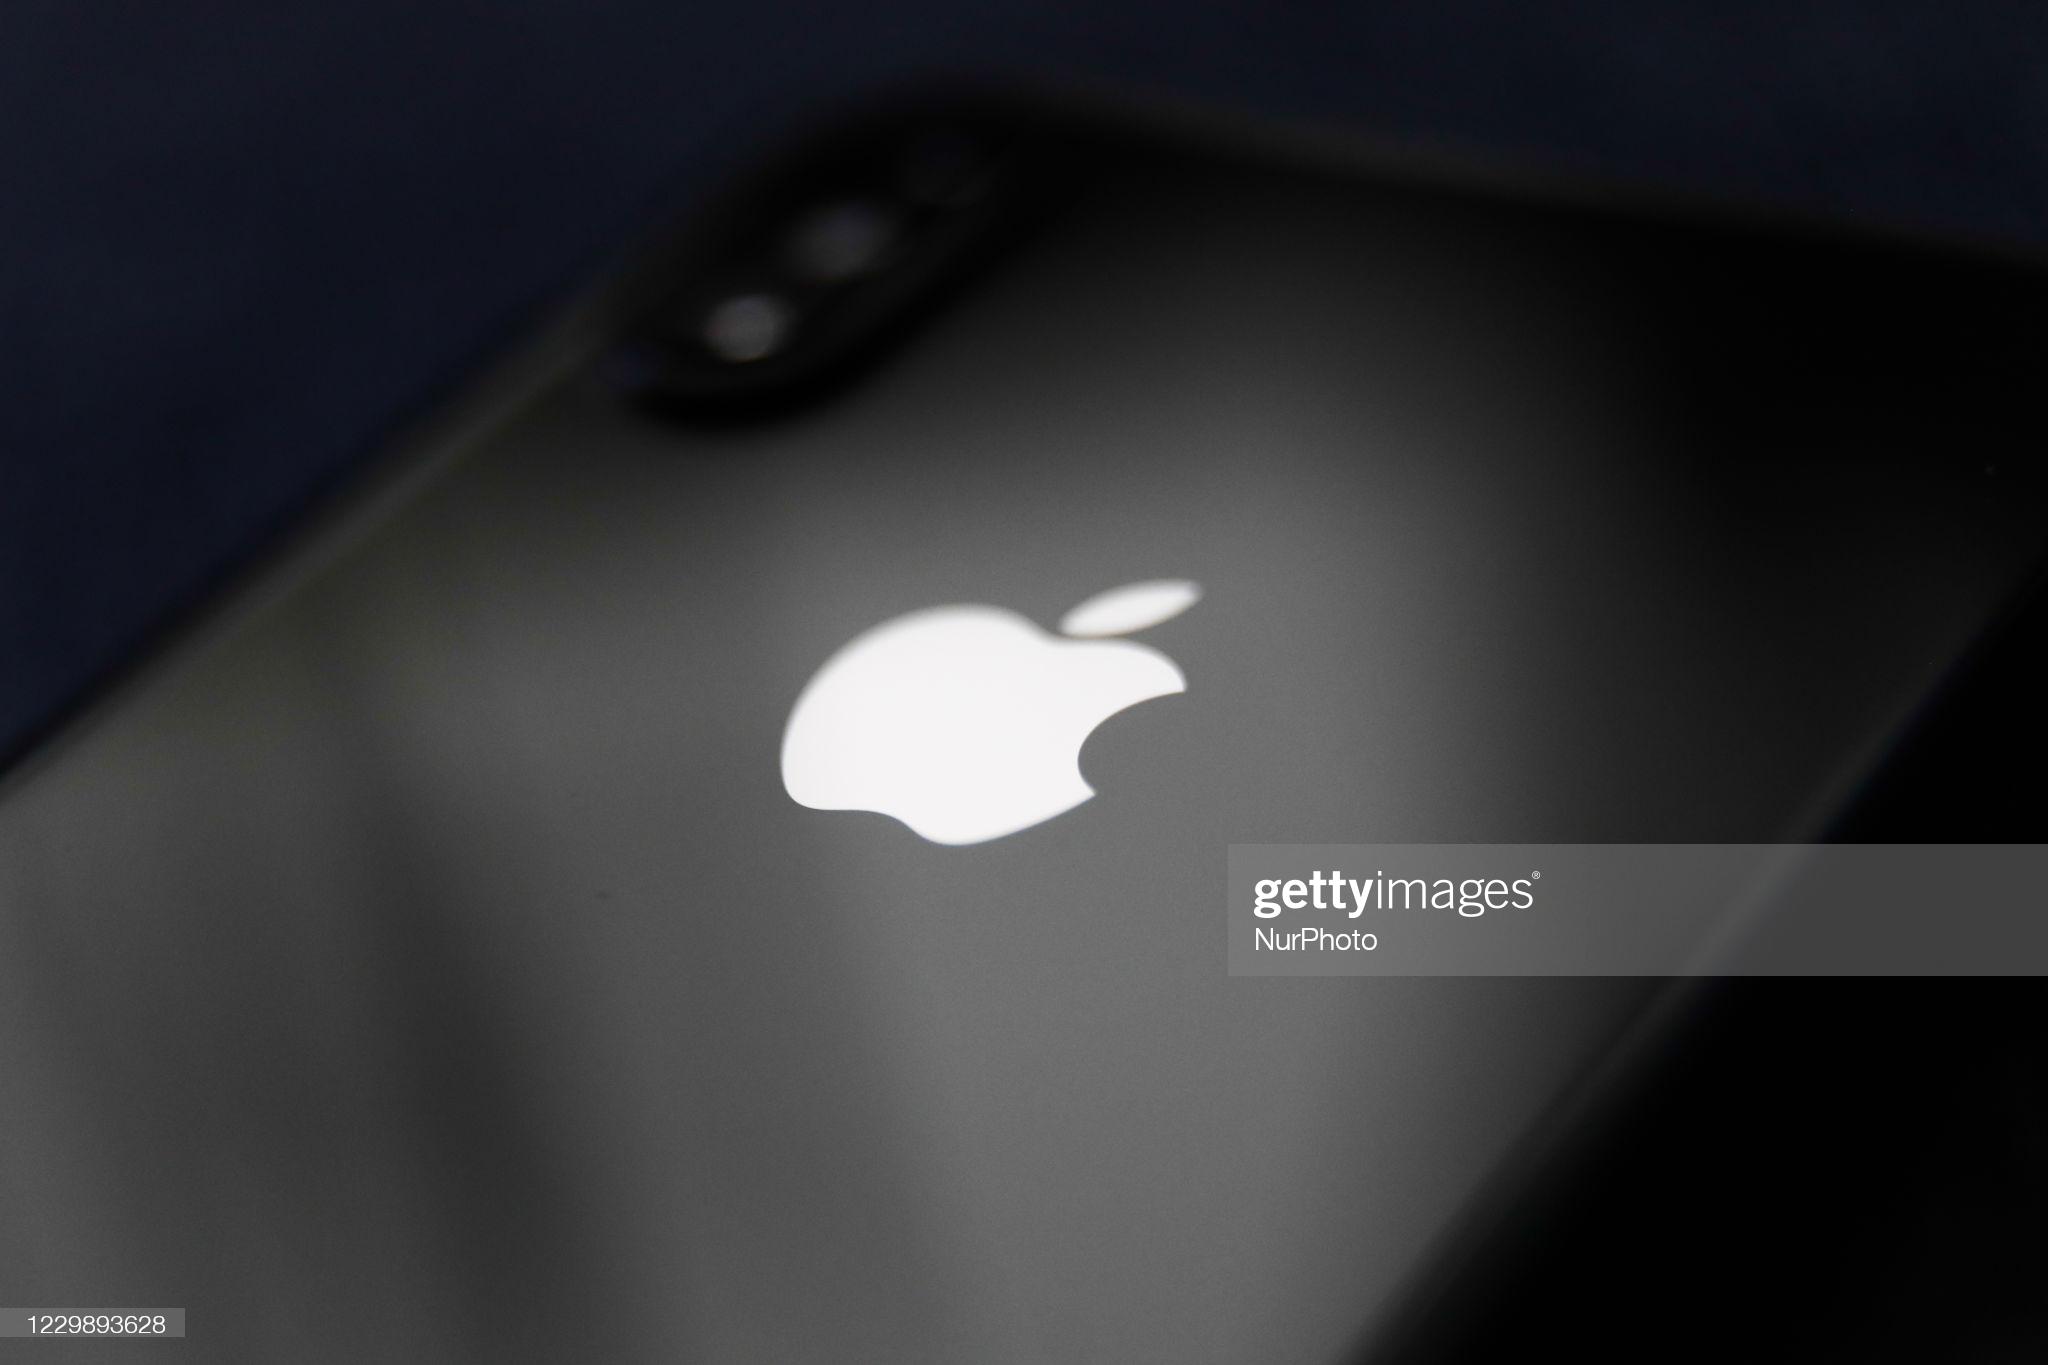 Apple logo is seen on a phone in this illustration photo taken in Poland on December 1, 2020. (Photo by Jakub Porzycki/NurPhoto via Getty Images)